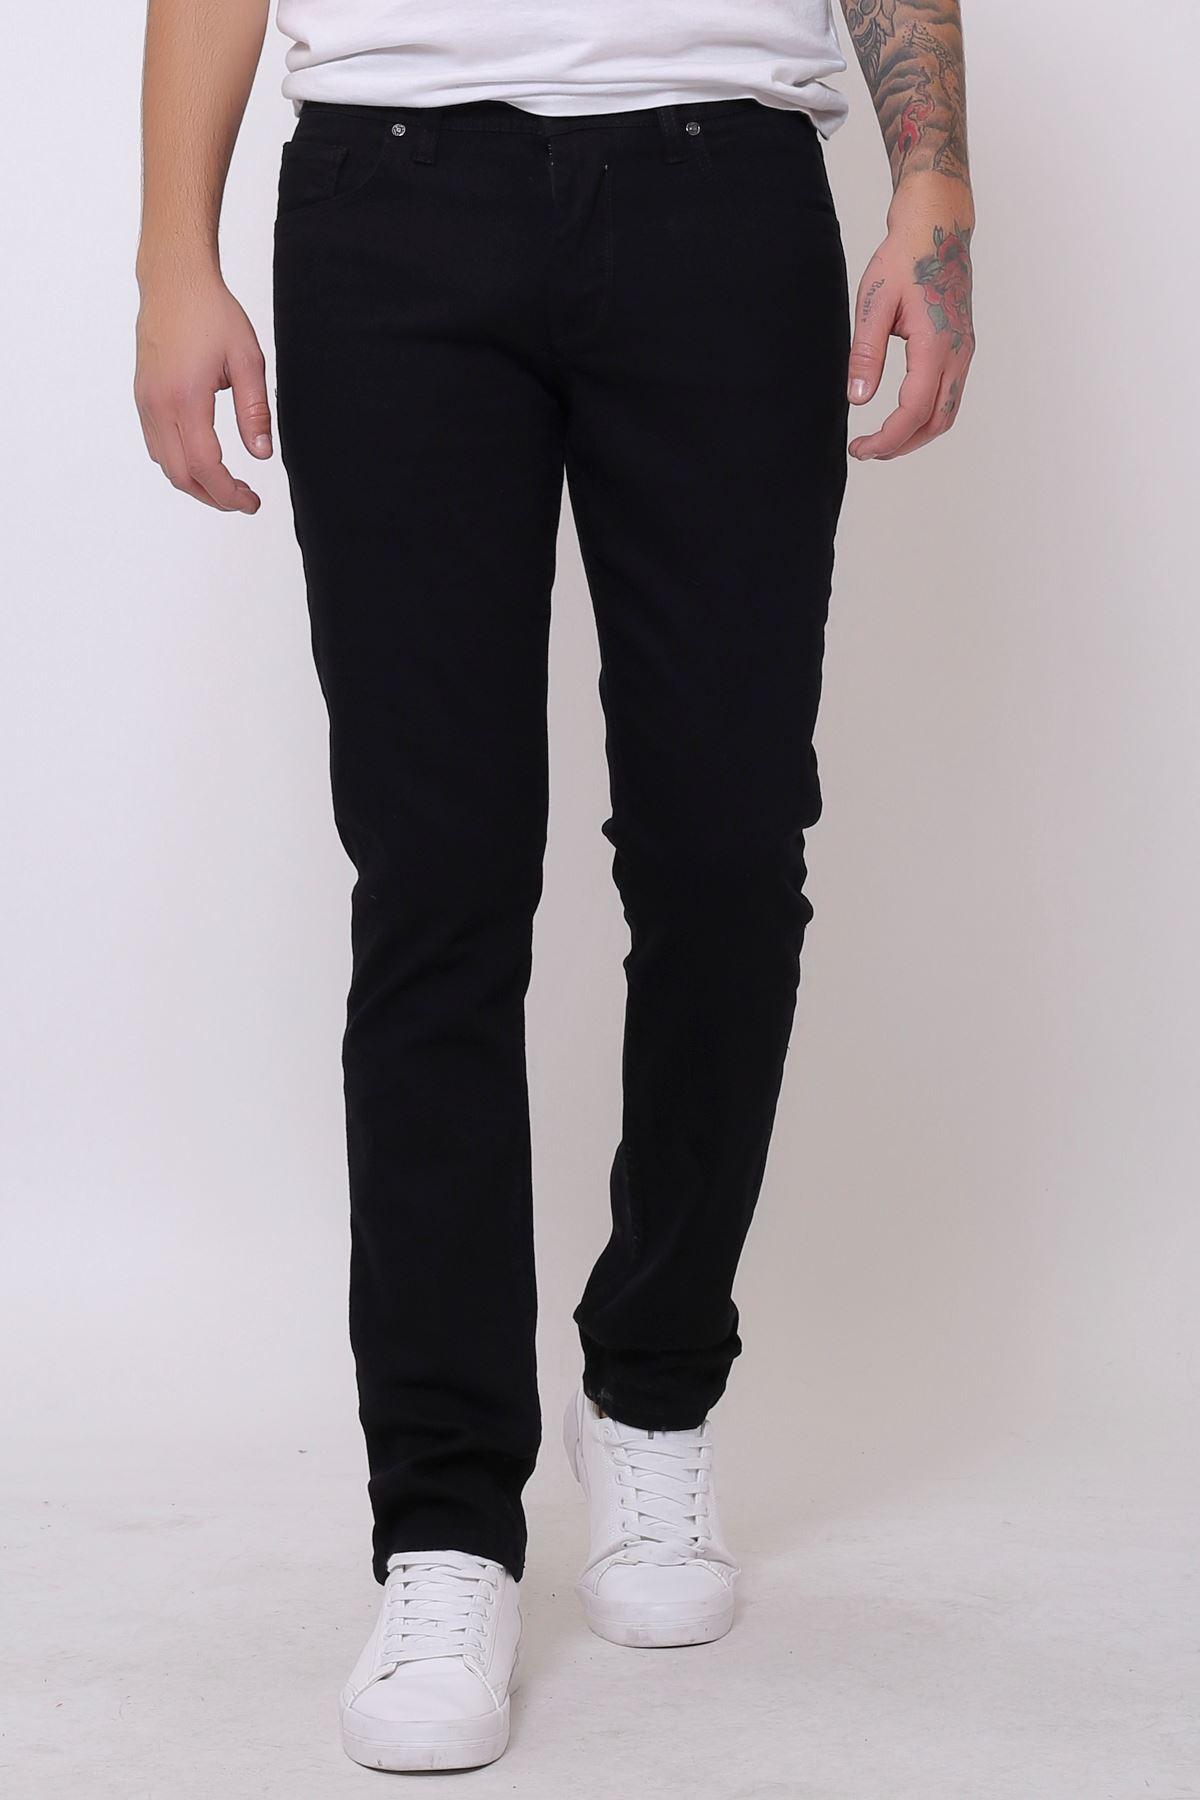 Yeni Siyah Slim Fit Fermuarlı Erkek Jeans Pantolon